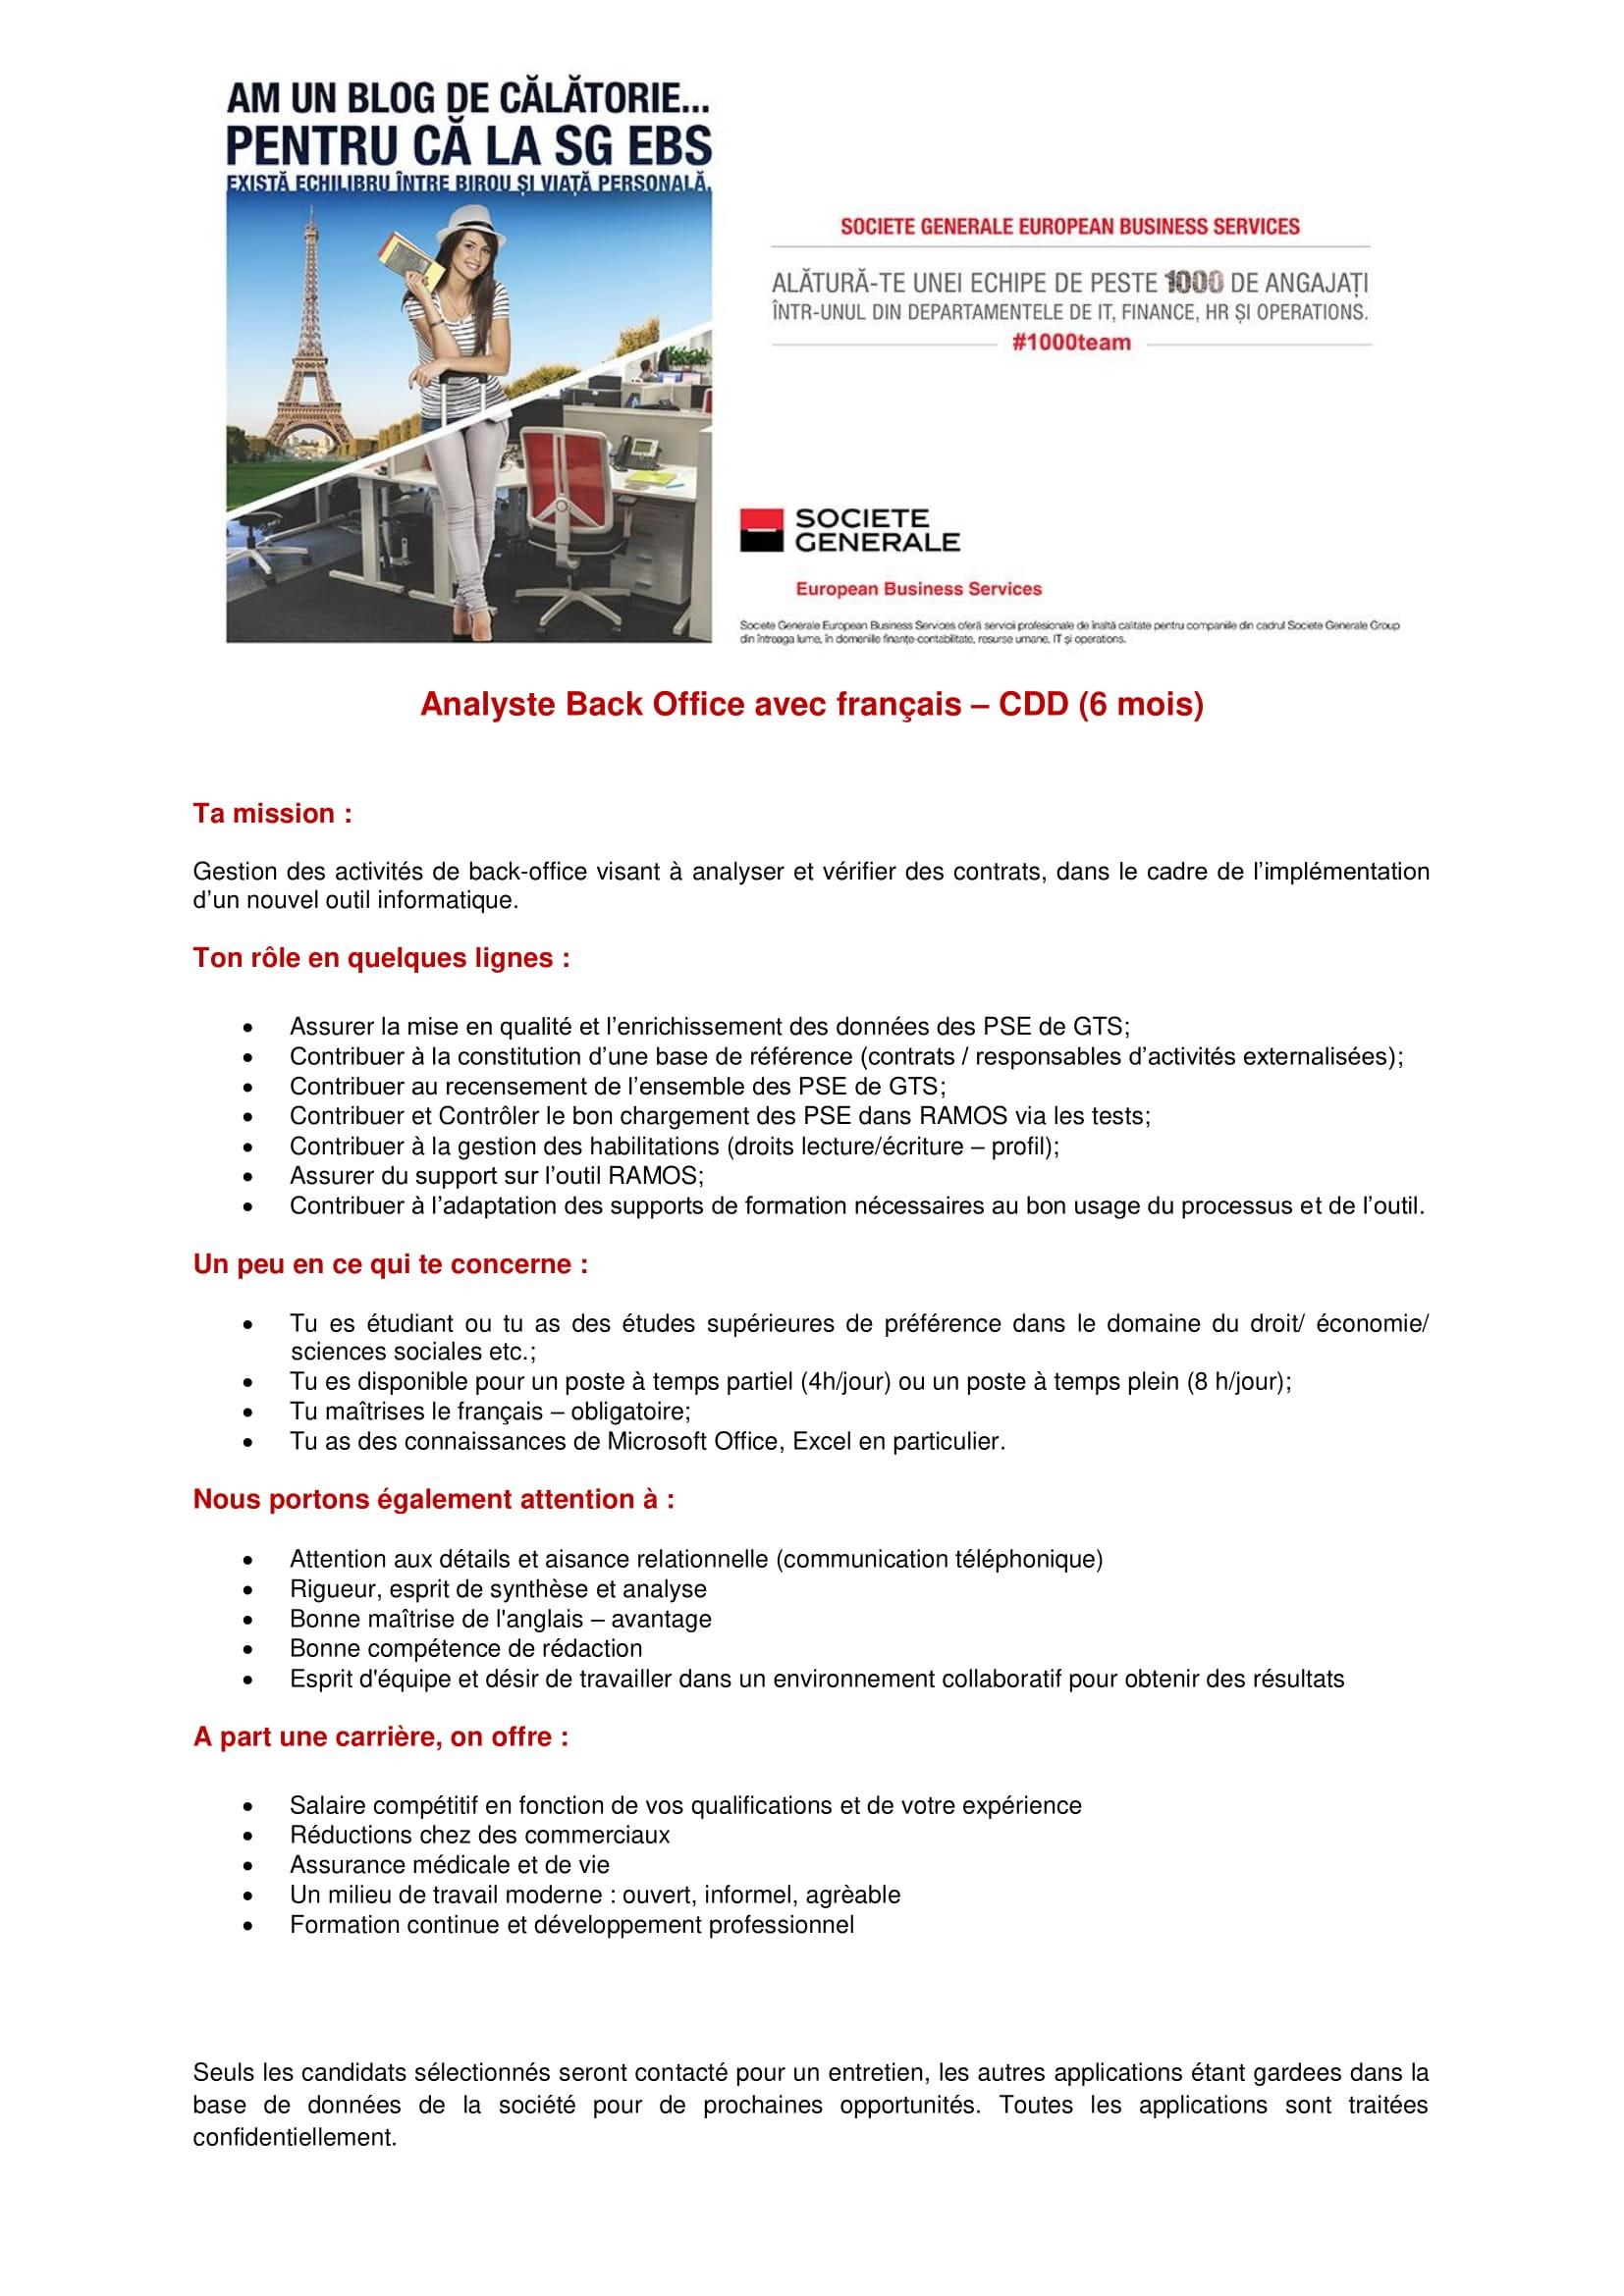 Analyste Back Office avec français – CDD (6 mois) - site - uri-1